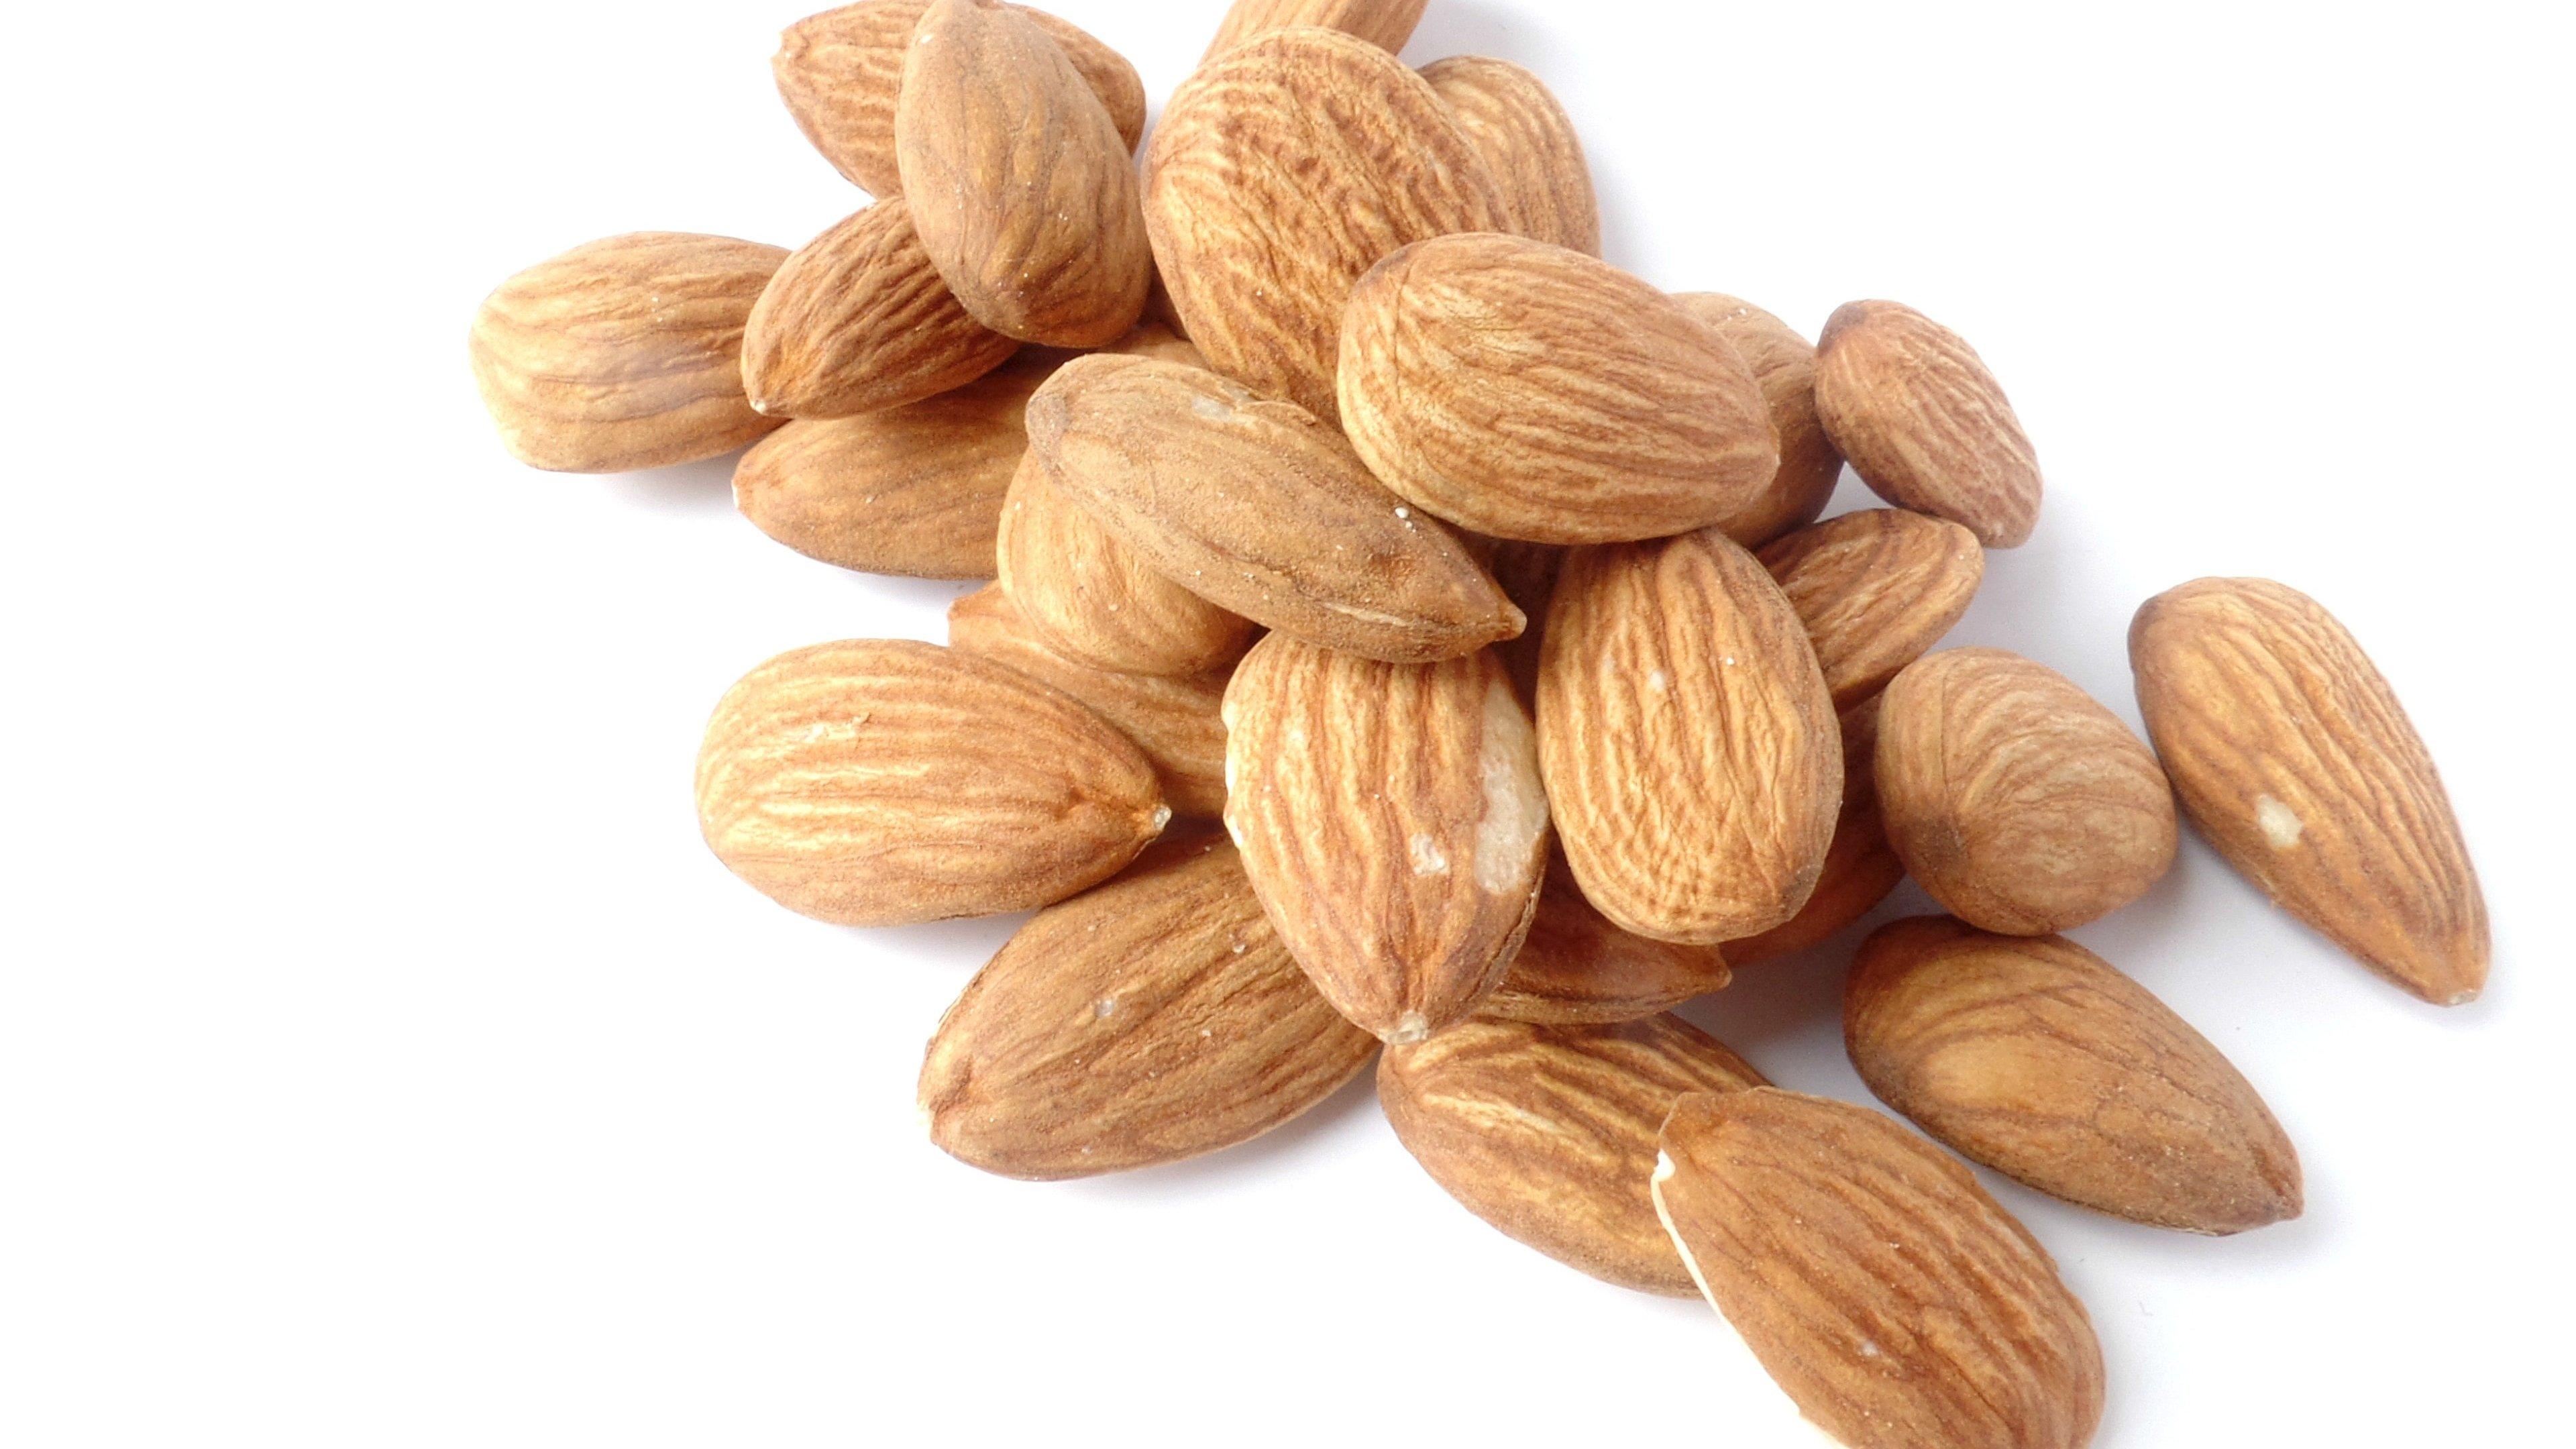 almonds wallpaper - mobile & desktop background